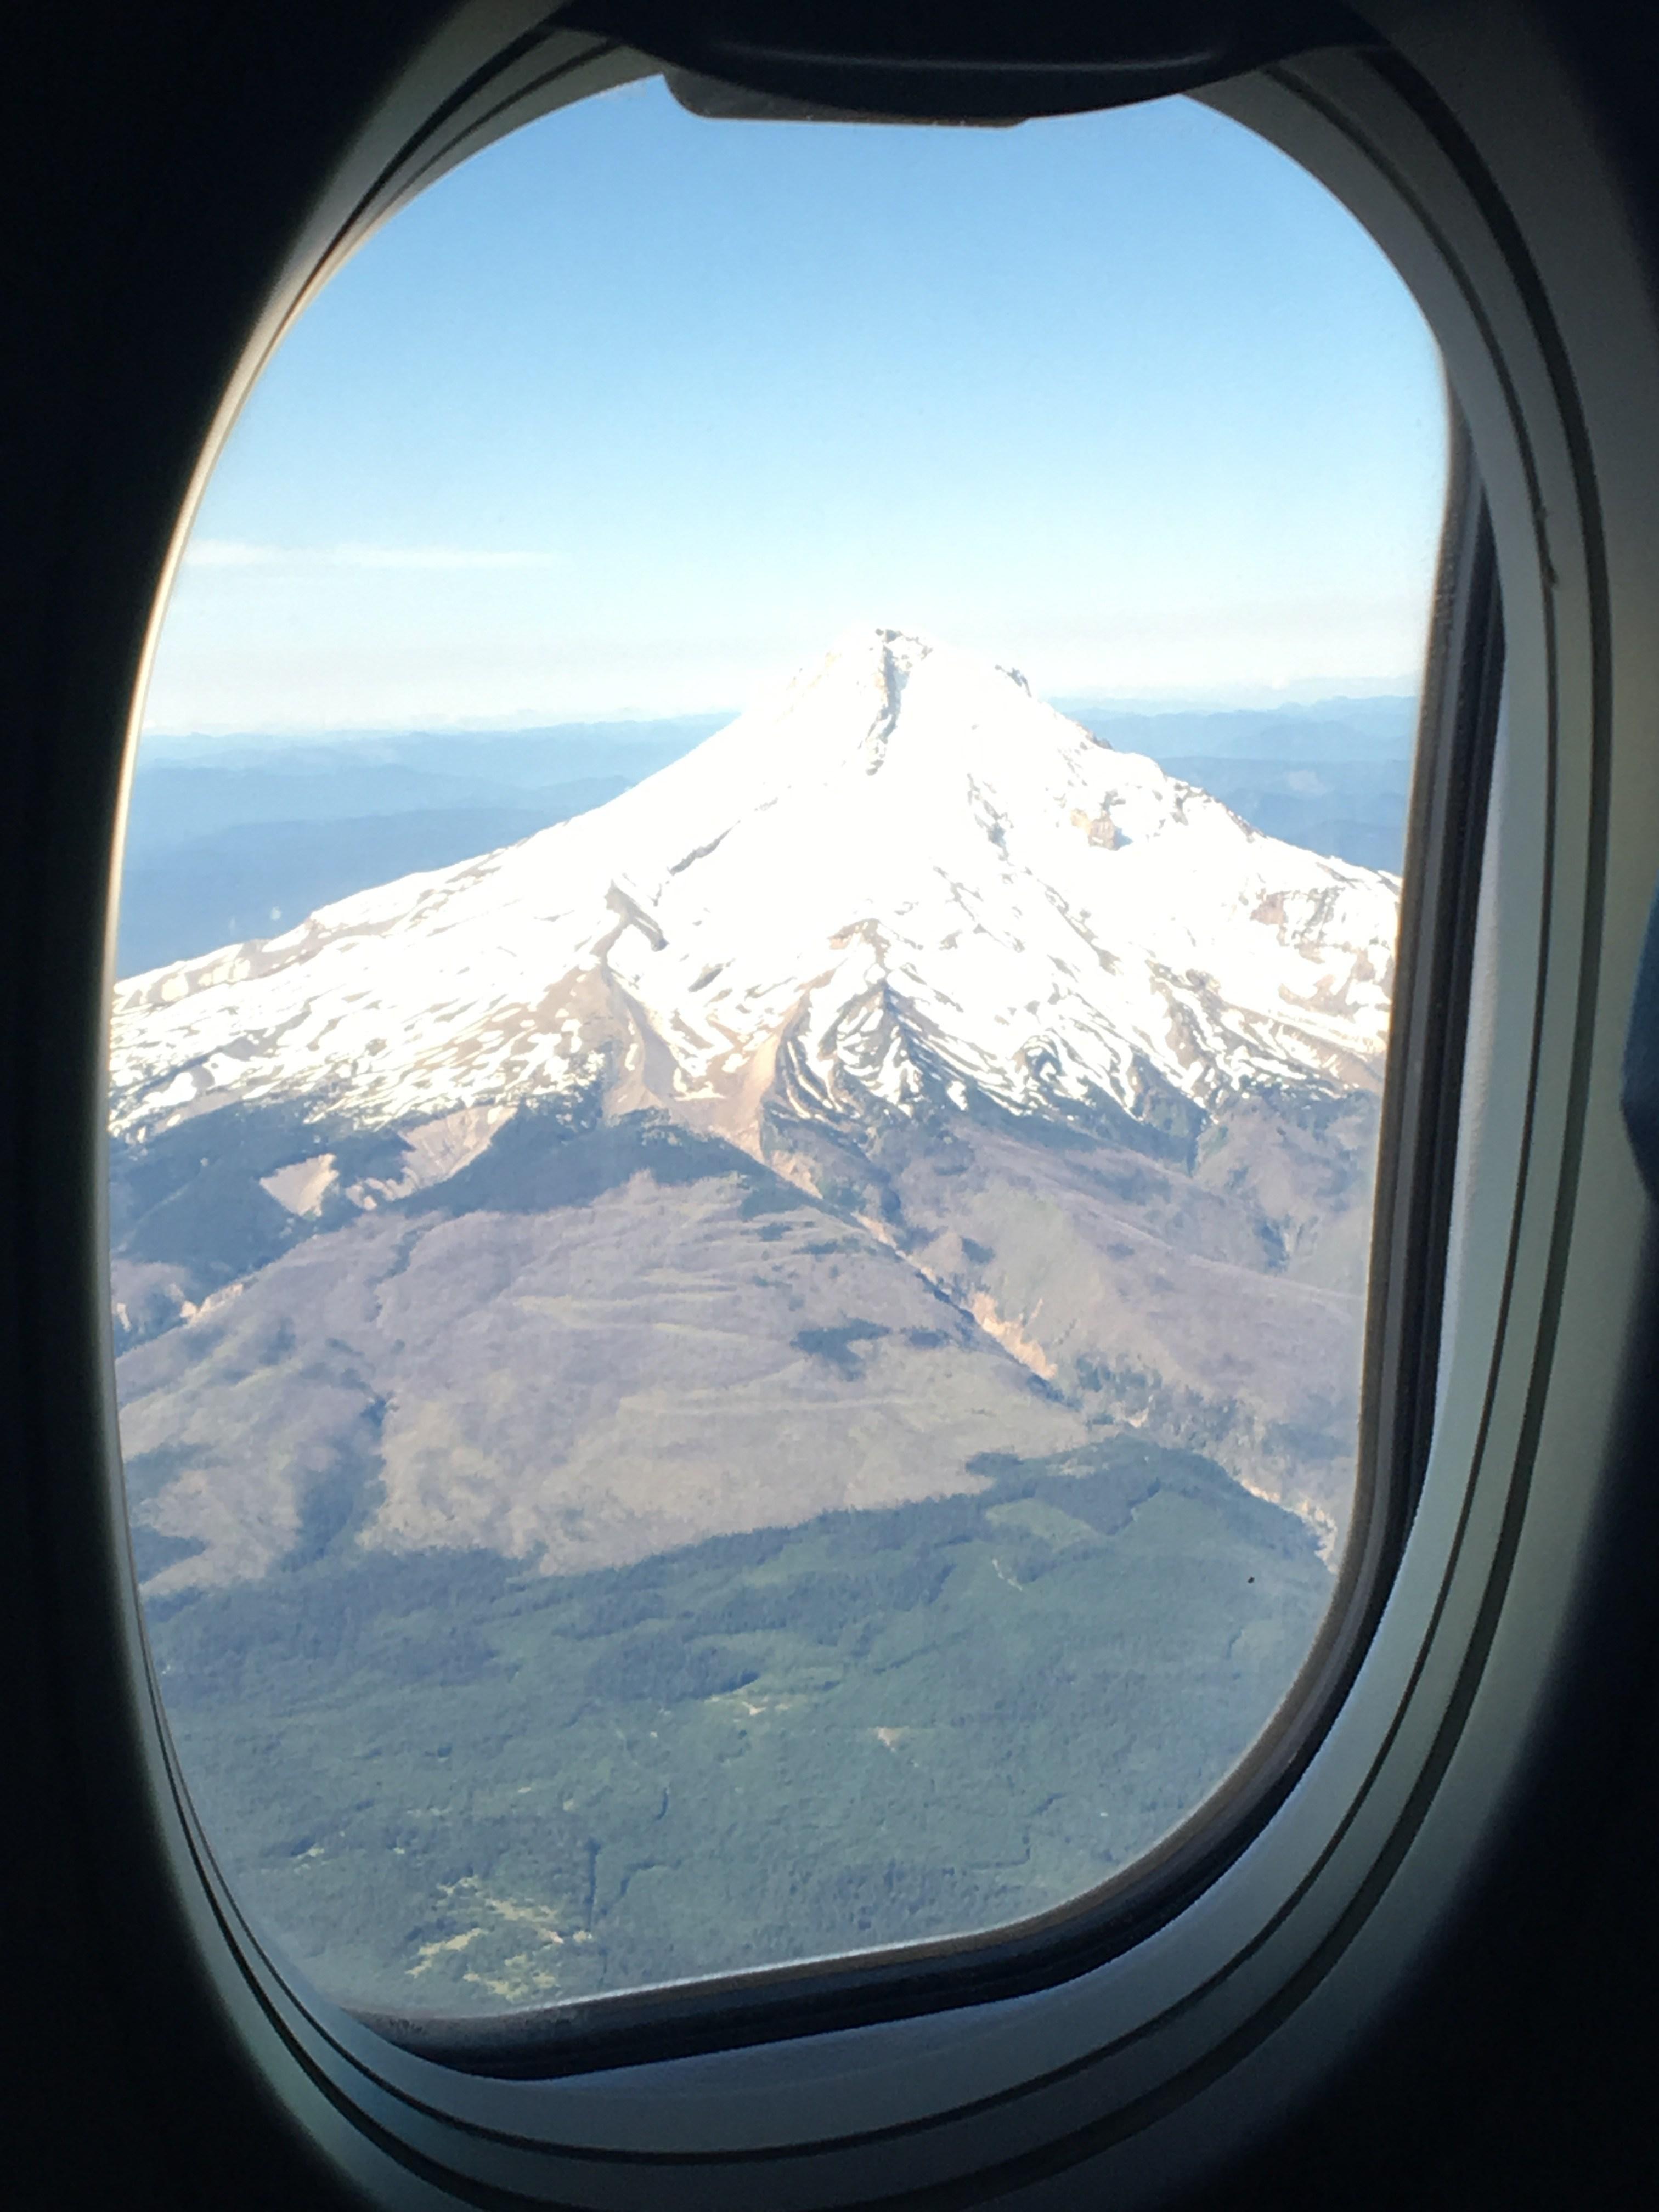 Mt. Hood from an airplane window